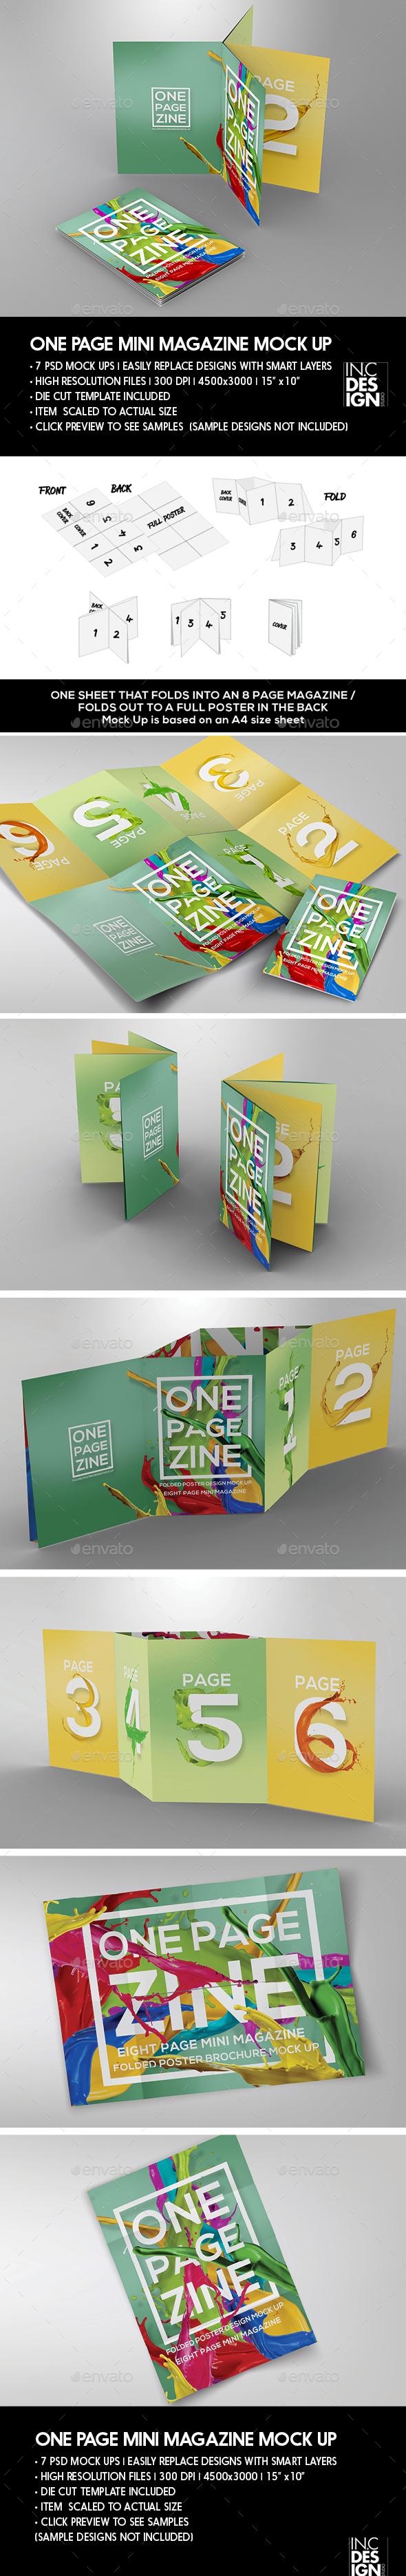 One Page Mini MagaZine   Foldout Poster Booklet - Magazines Print